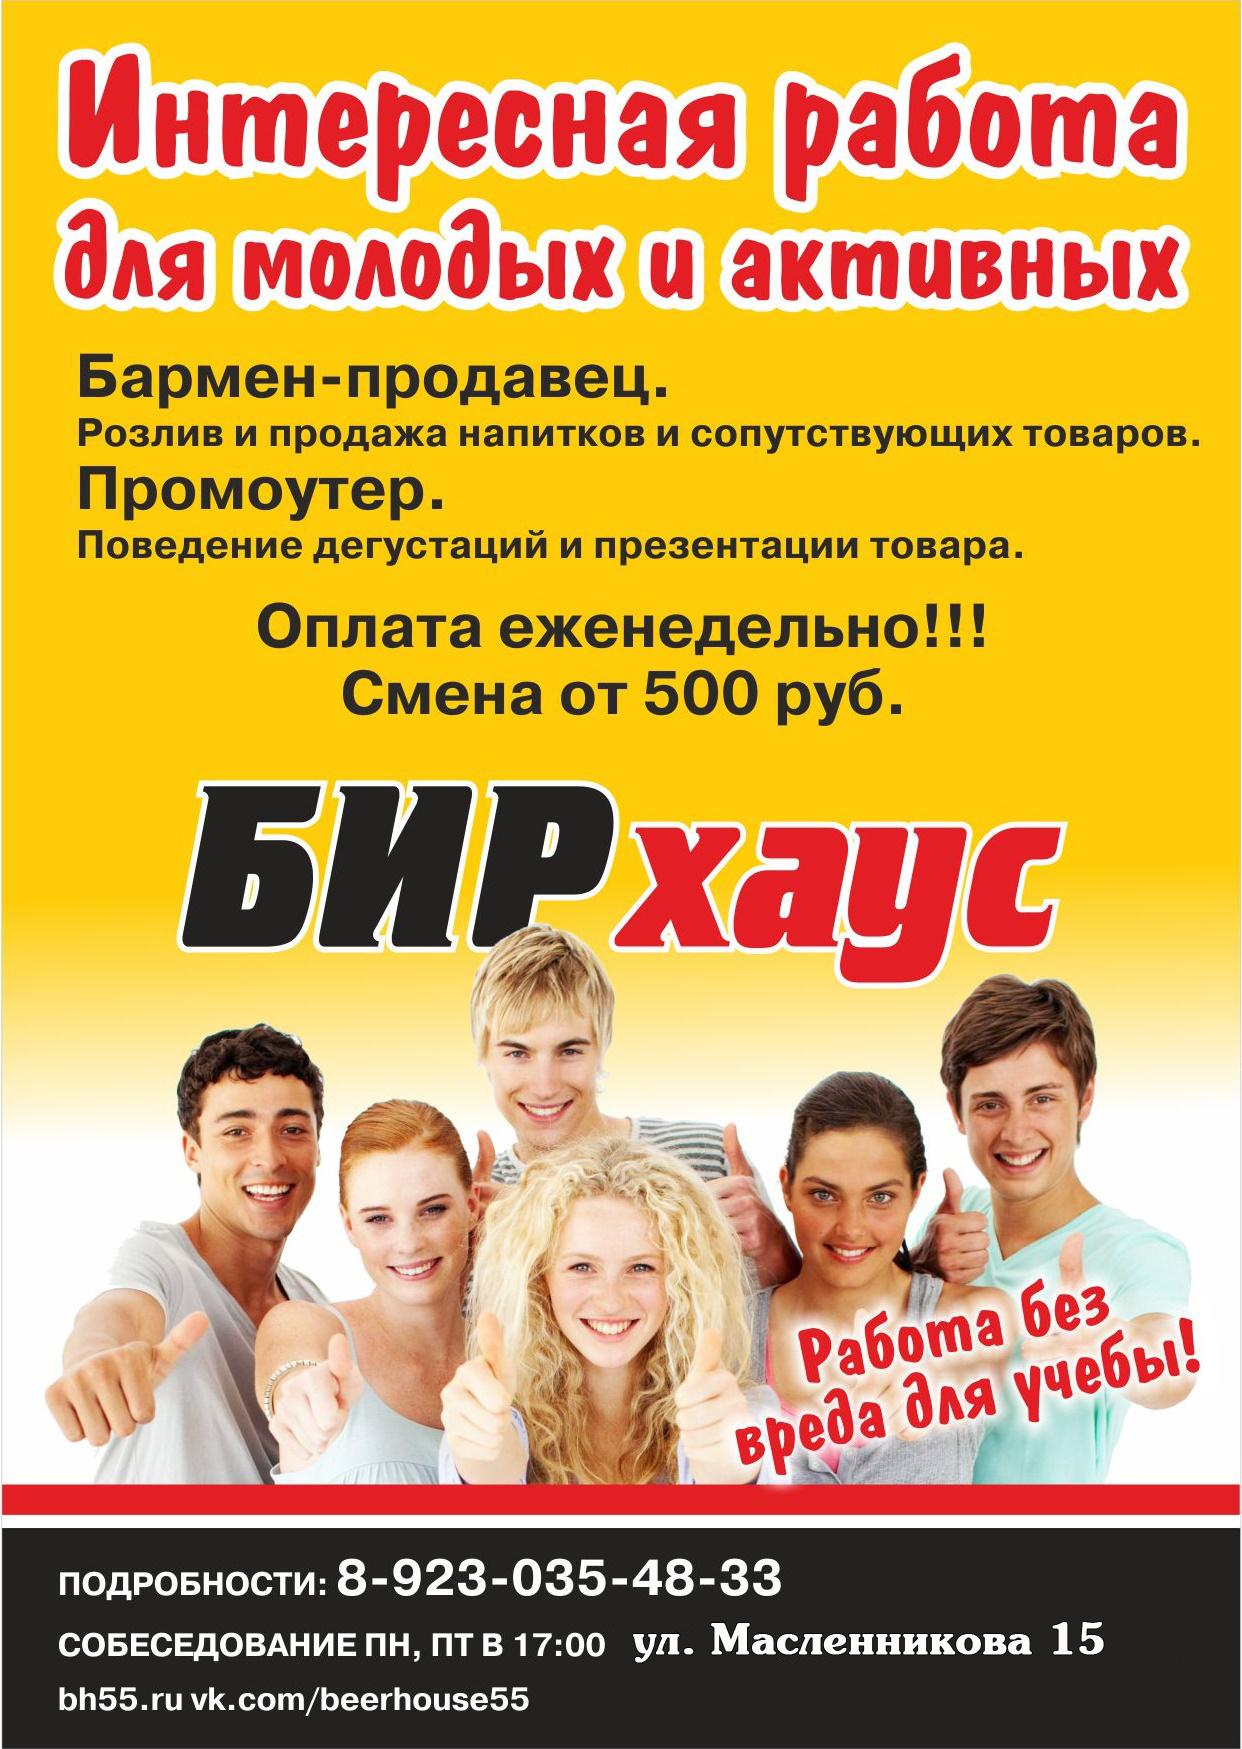 http://bh55.ru/wp-content/uploads/2019/01/barpromo-kopiya.jpg